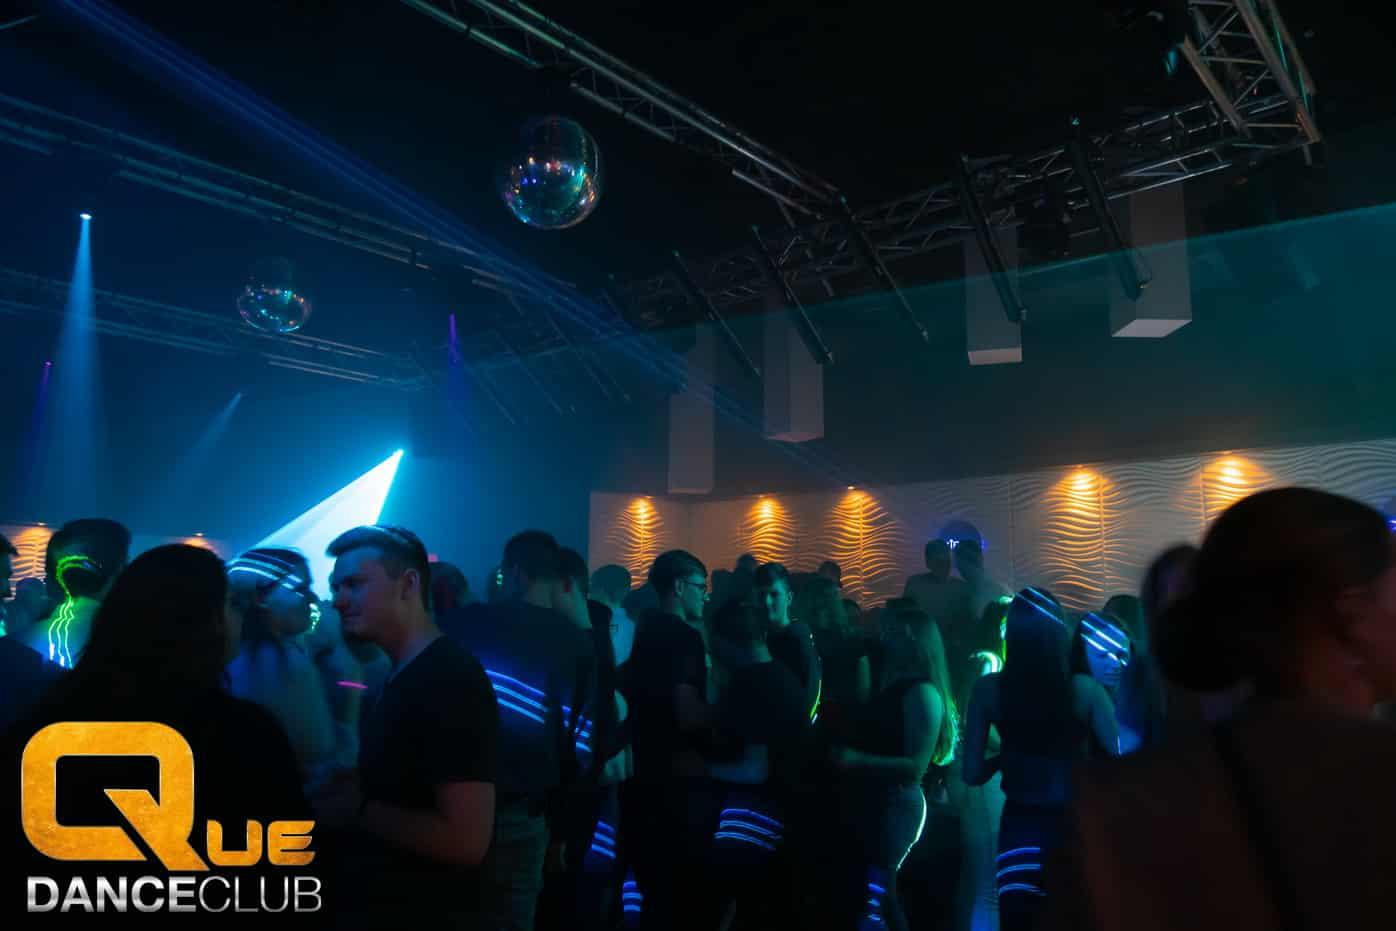 2018_11_23_Que_Danceclub_BLCK_FRDY_United_Nightlife_Scene_Timo_013